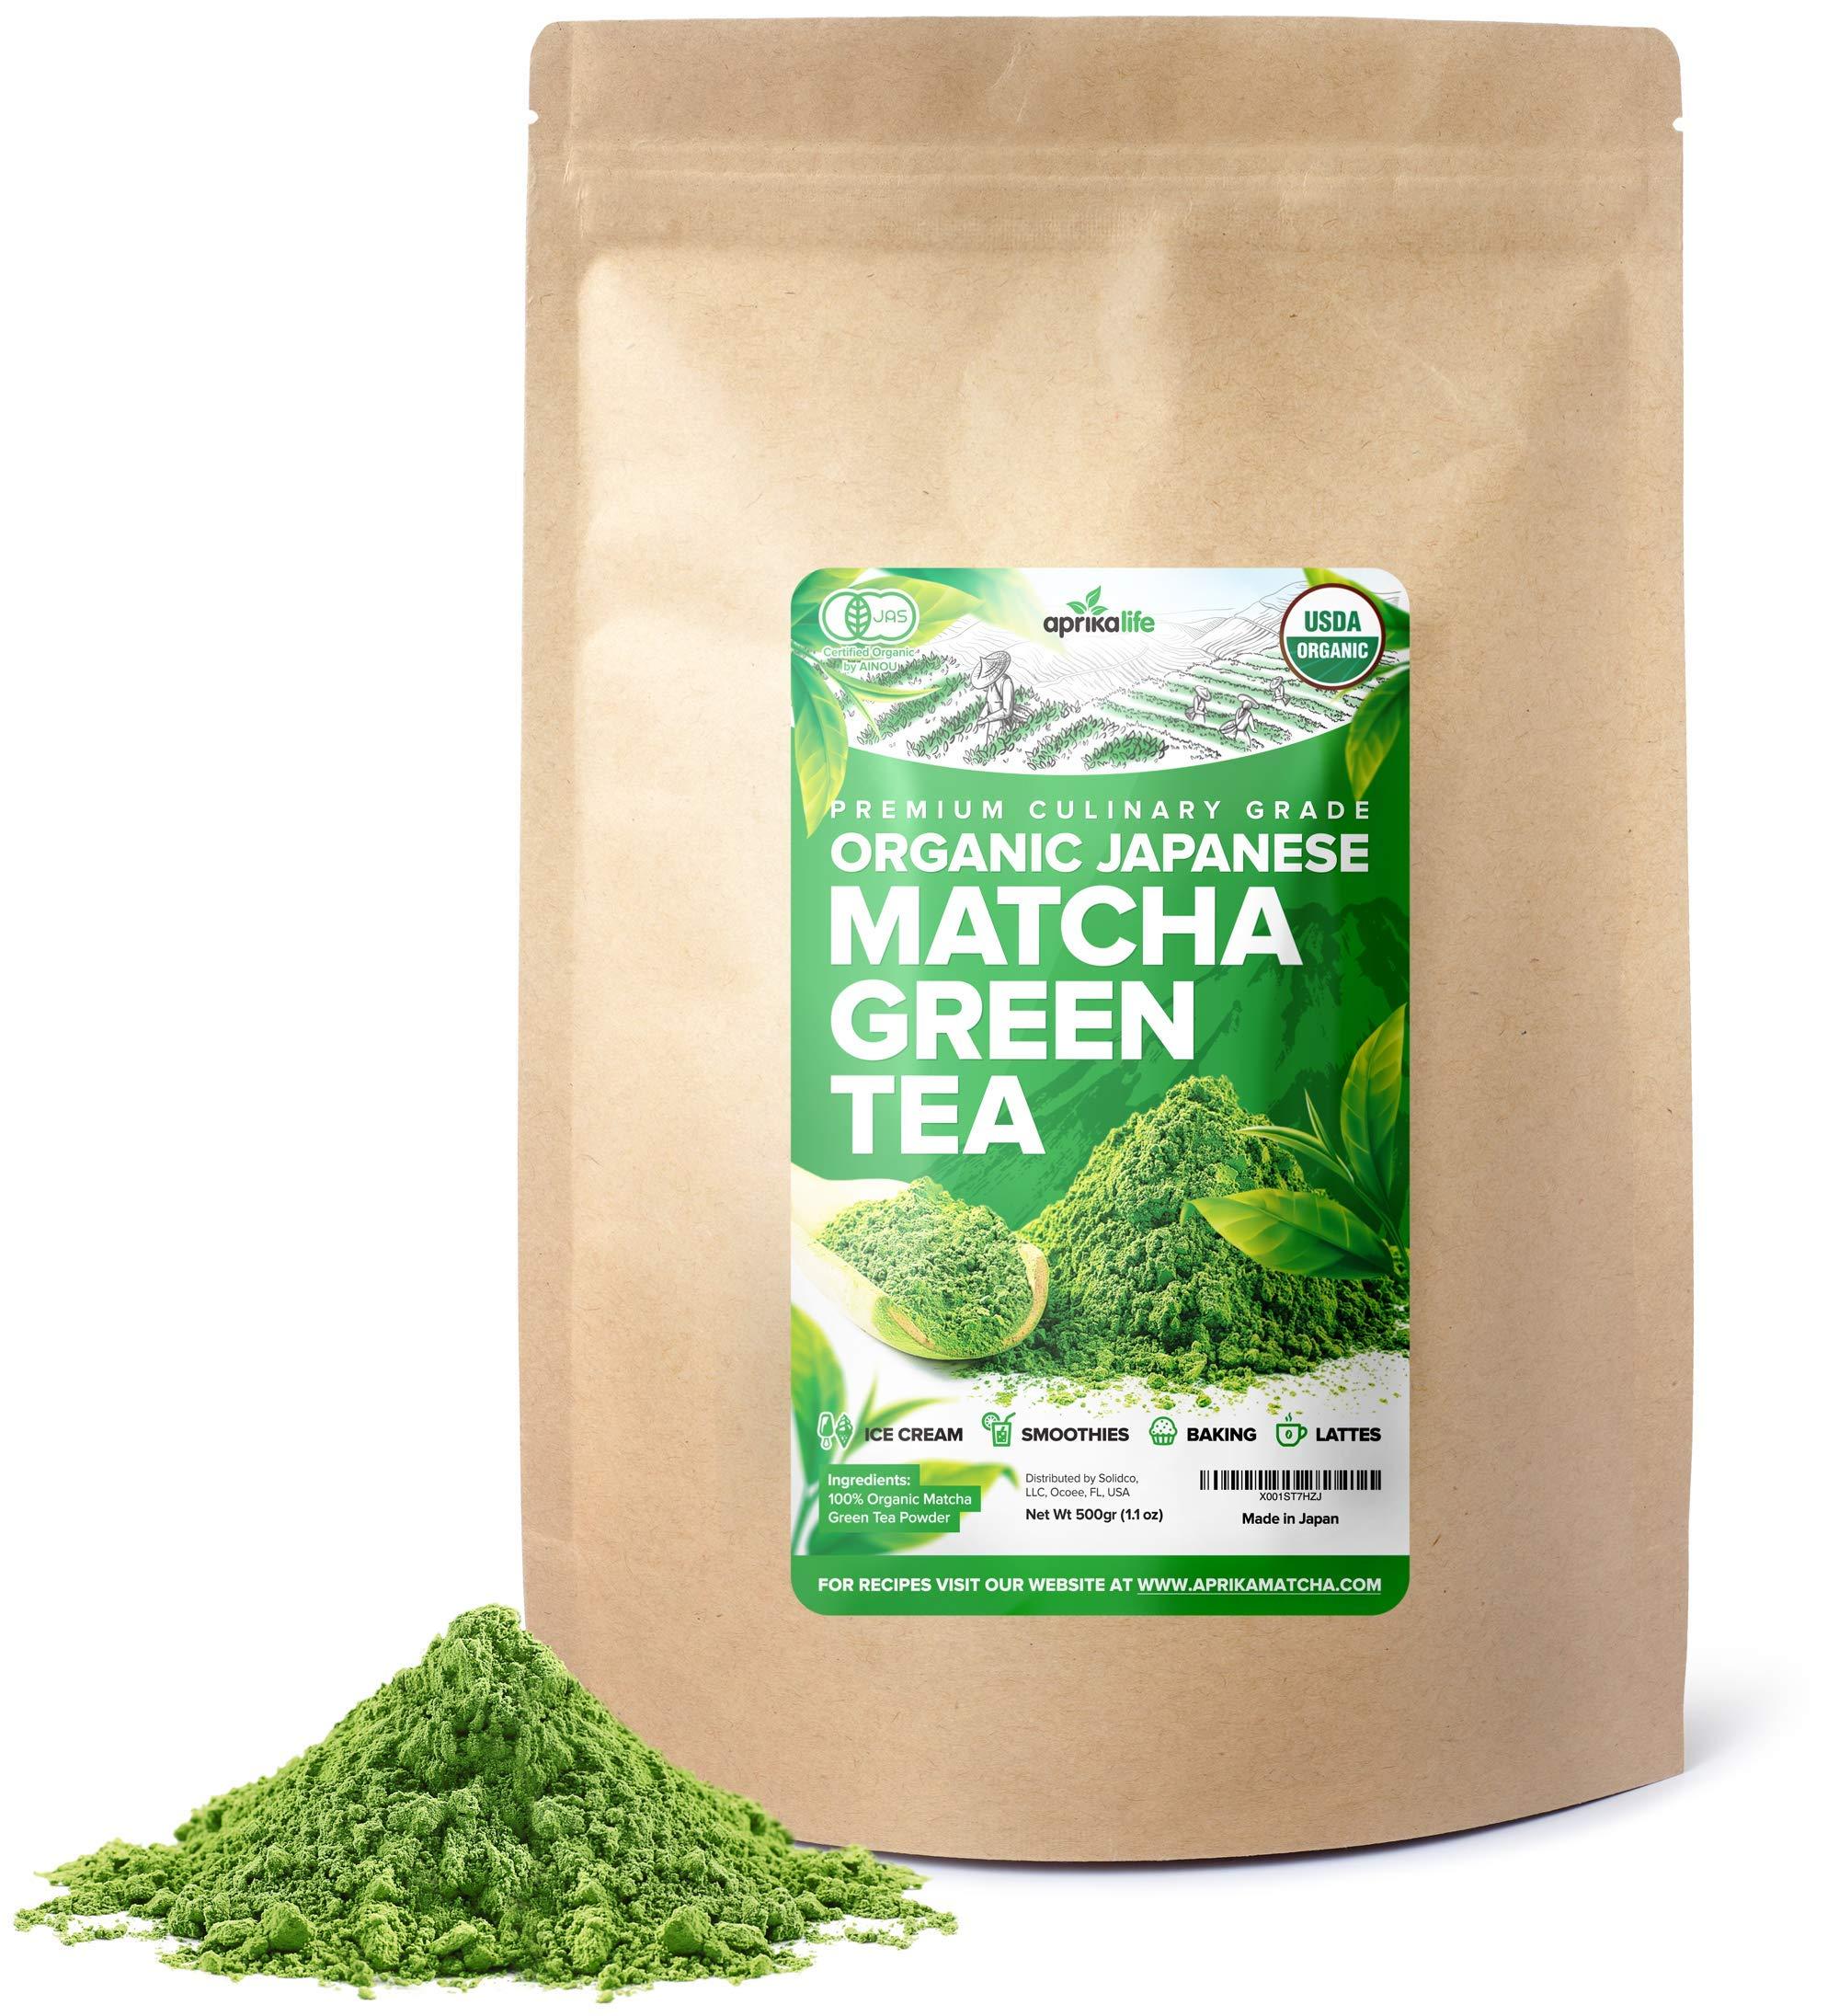 Premium Organic Japanese Matcha Green Tea Powder - USDA & JAS Organic - Authentic Japanese Origin - Culinary Grade - [500g / 1.1 LB Value Size]